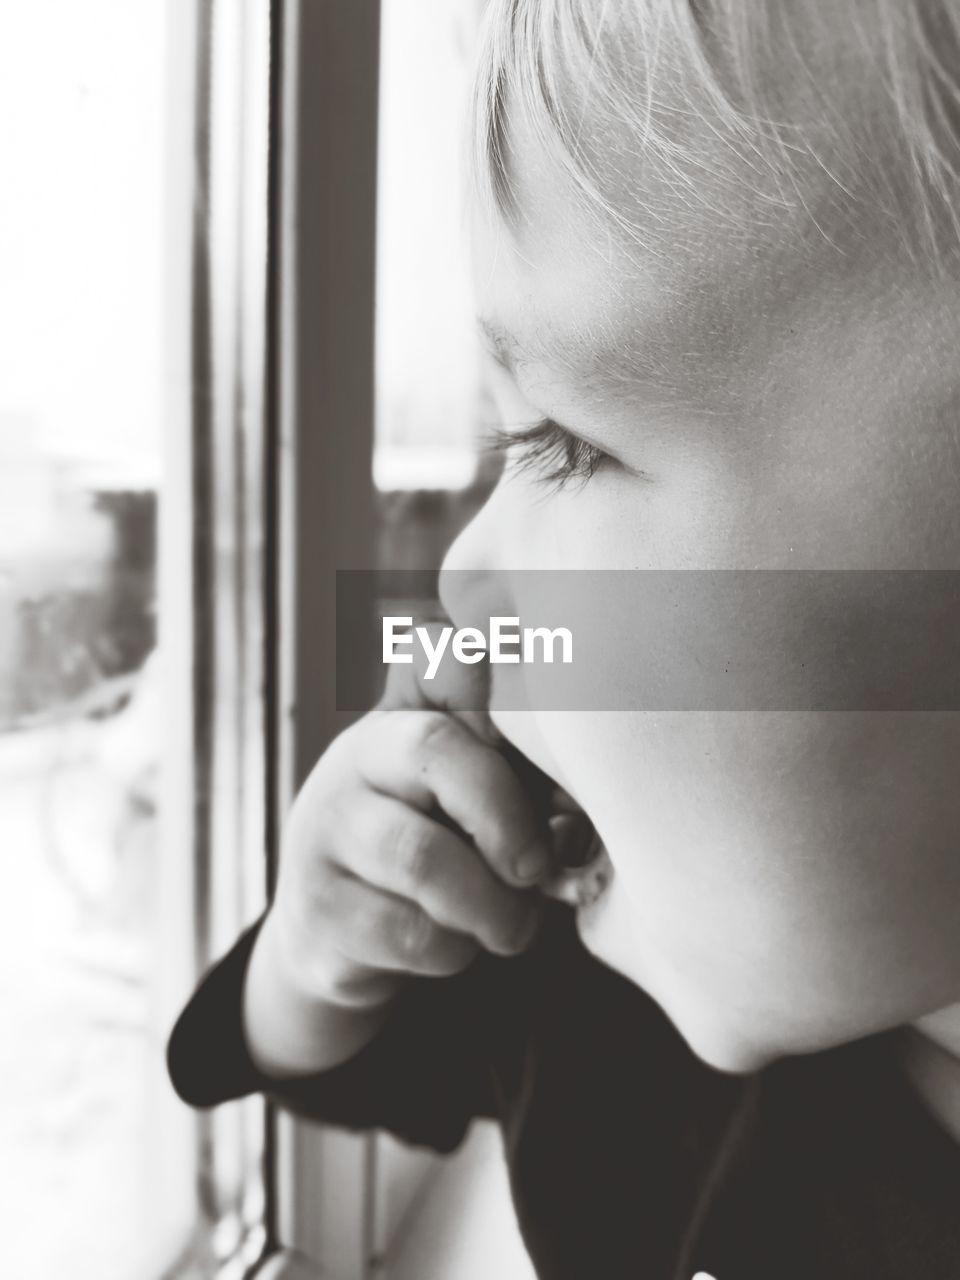 Close-up portrait of boy looking through window